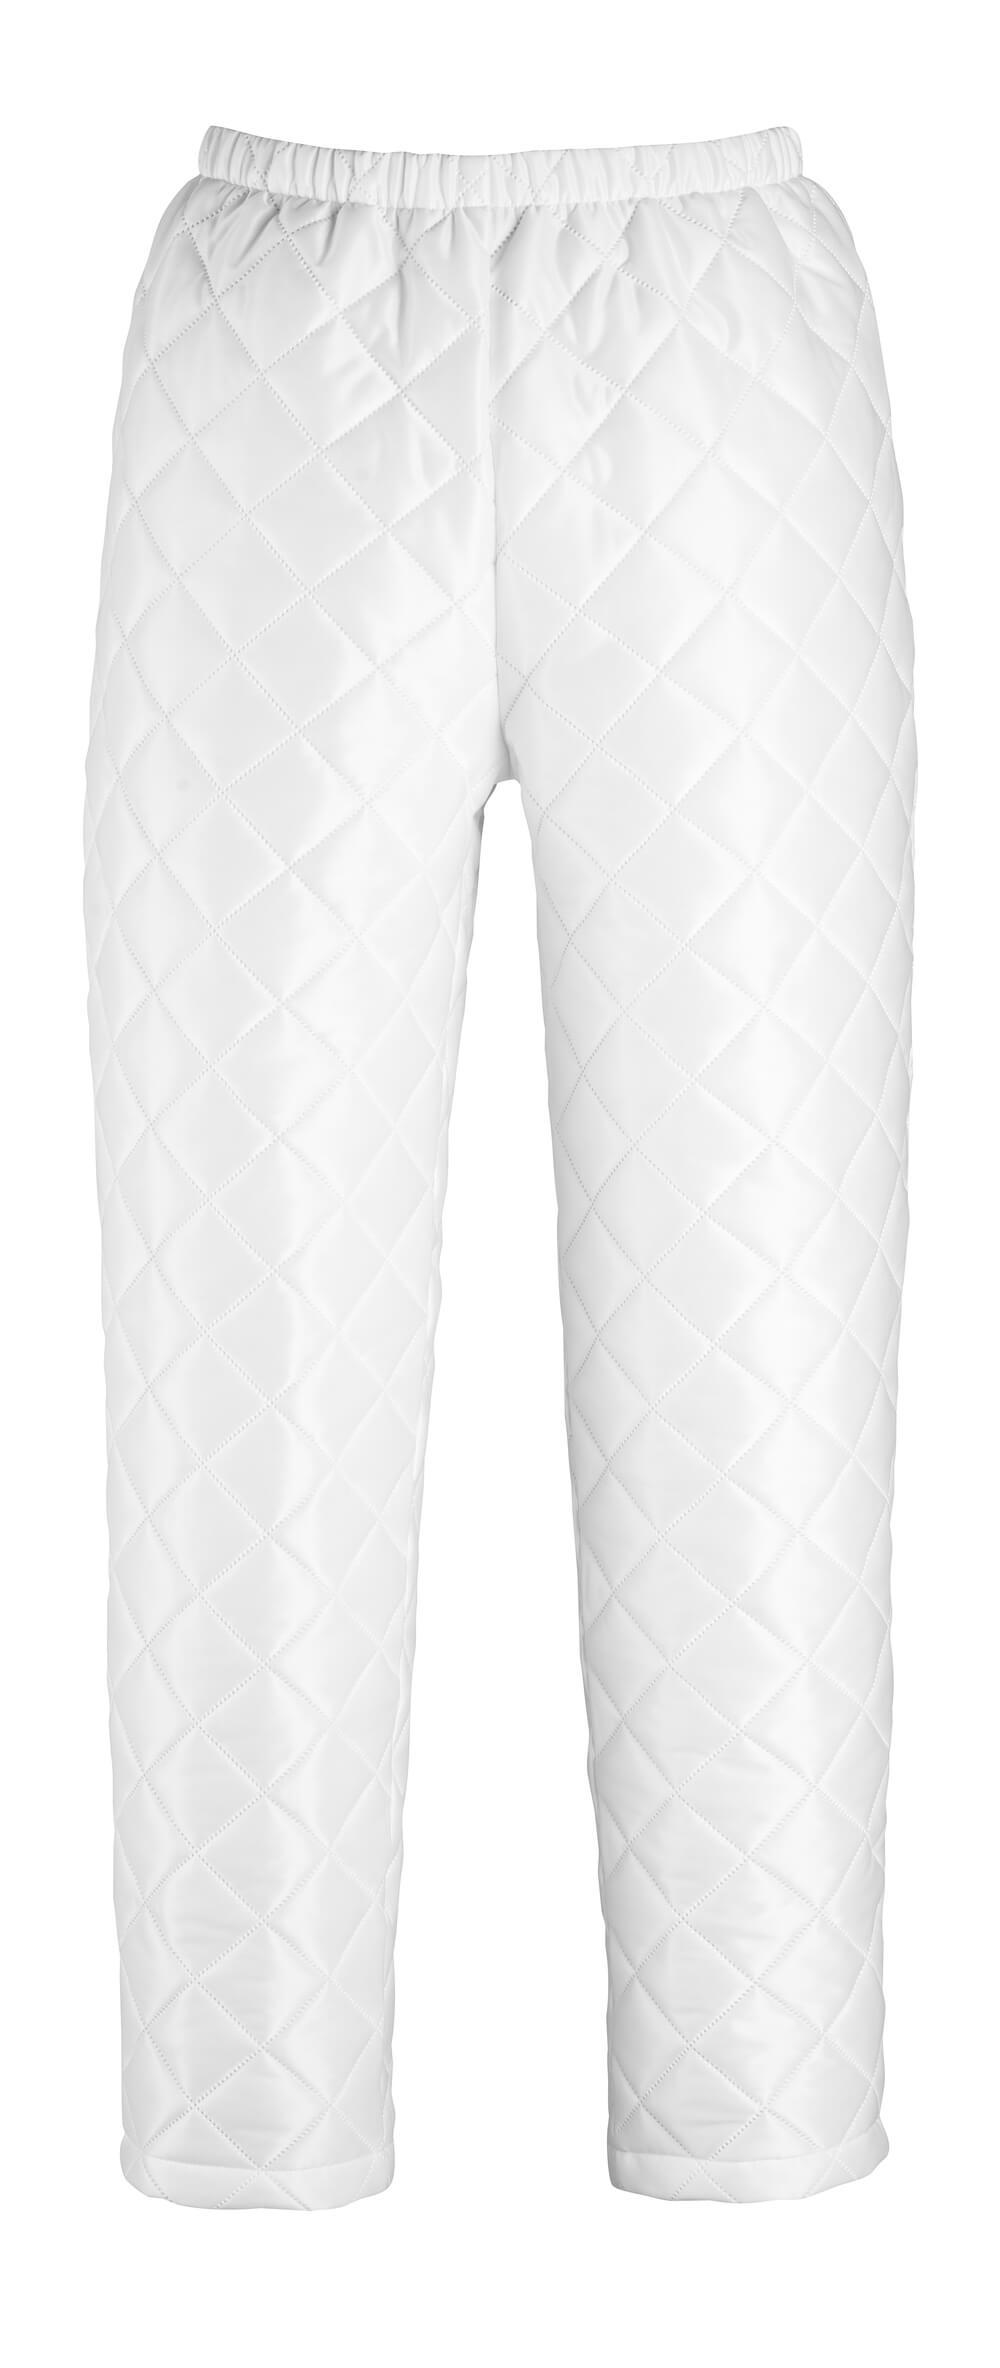 13578-707-06 Pantalones térmicos - blanco